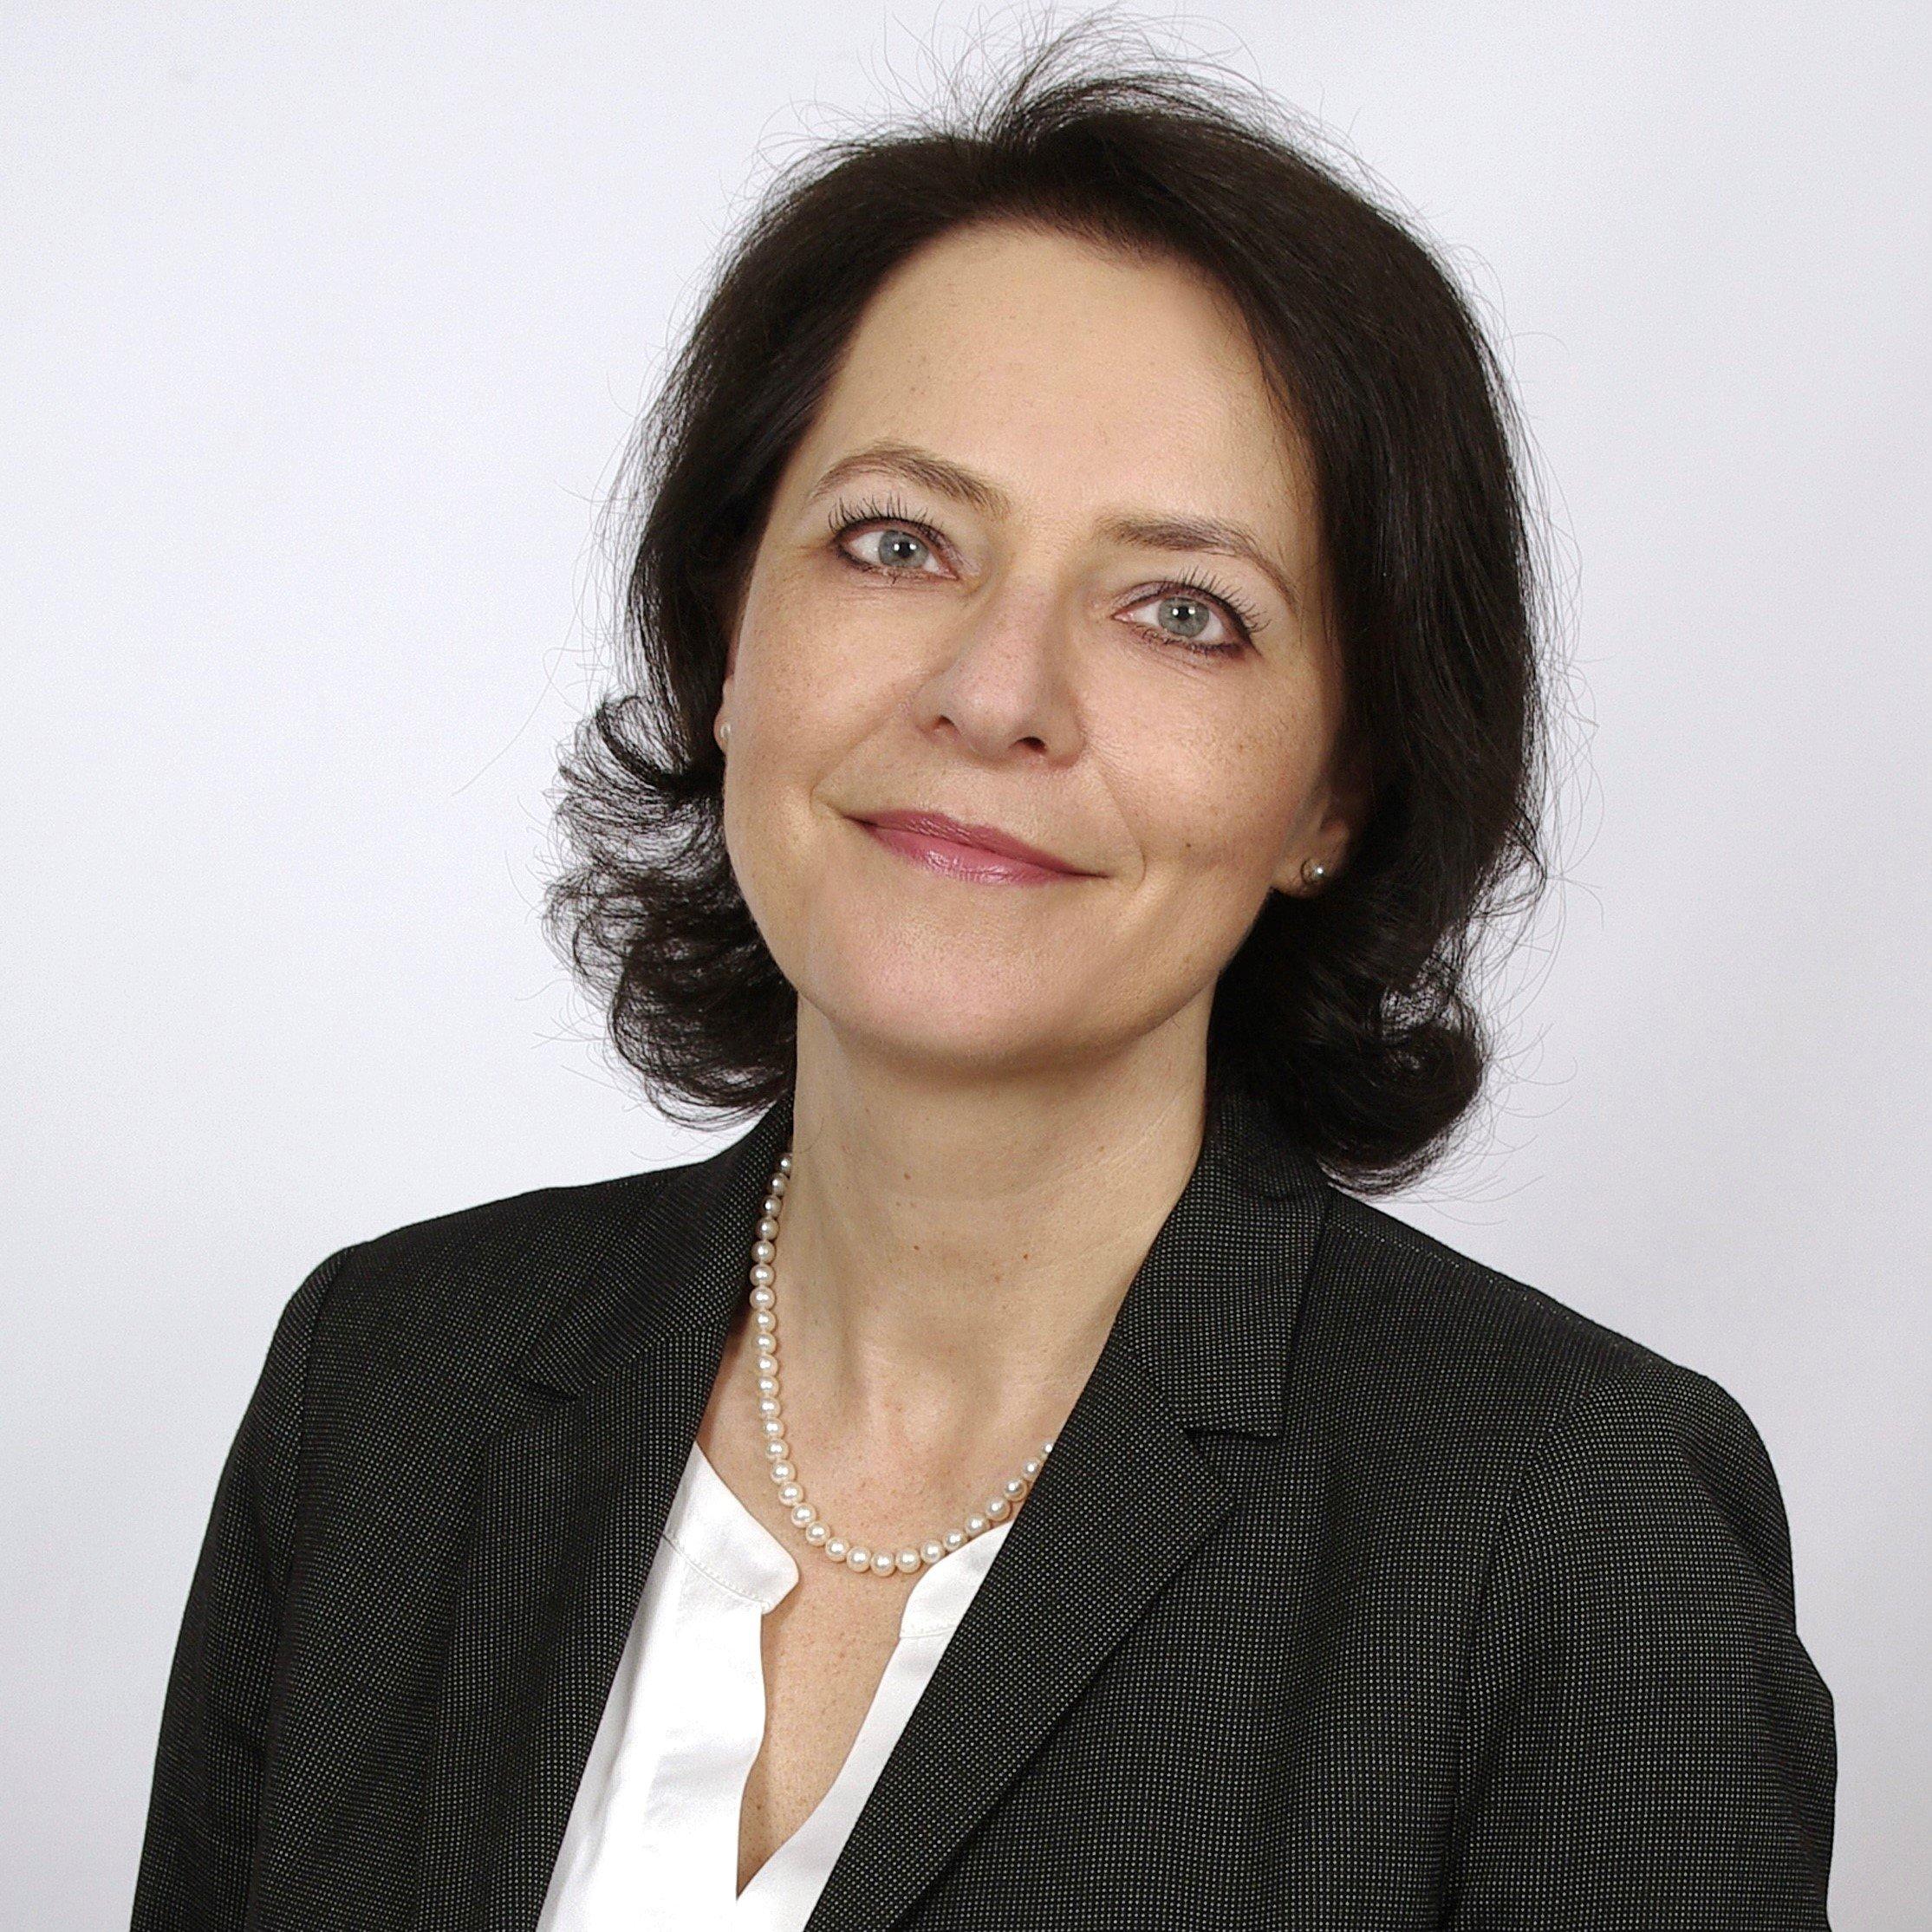 Prof. Dr. Christiane Weiland